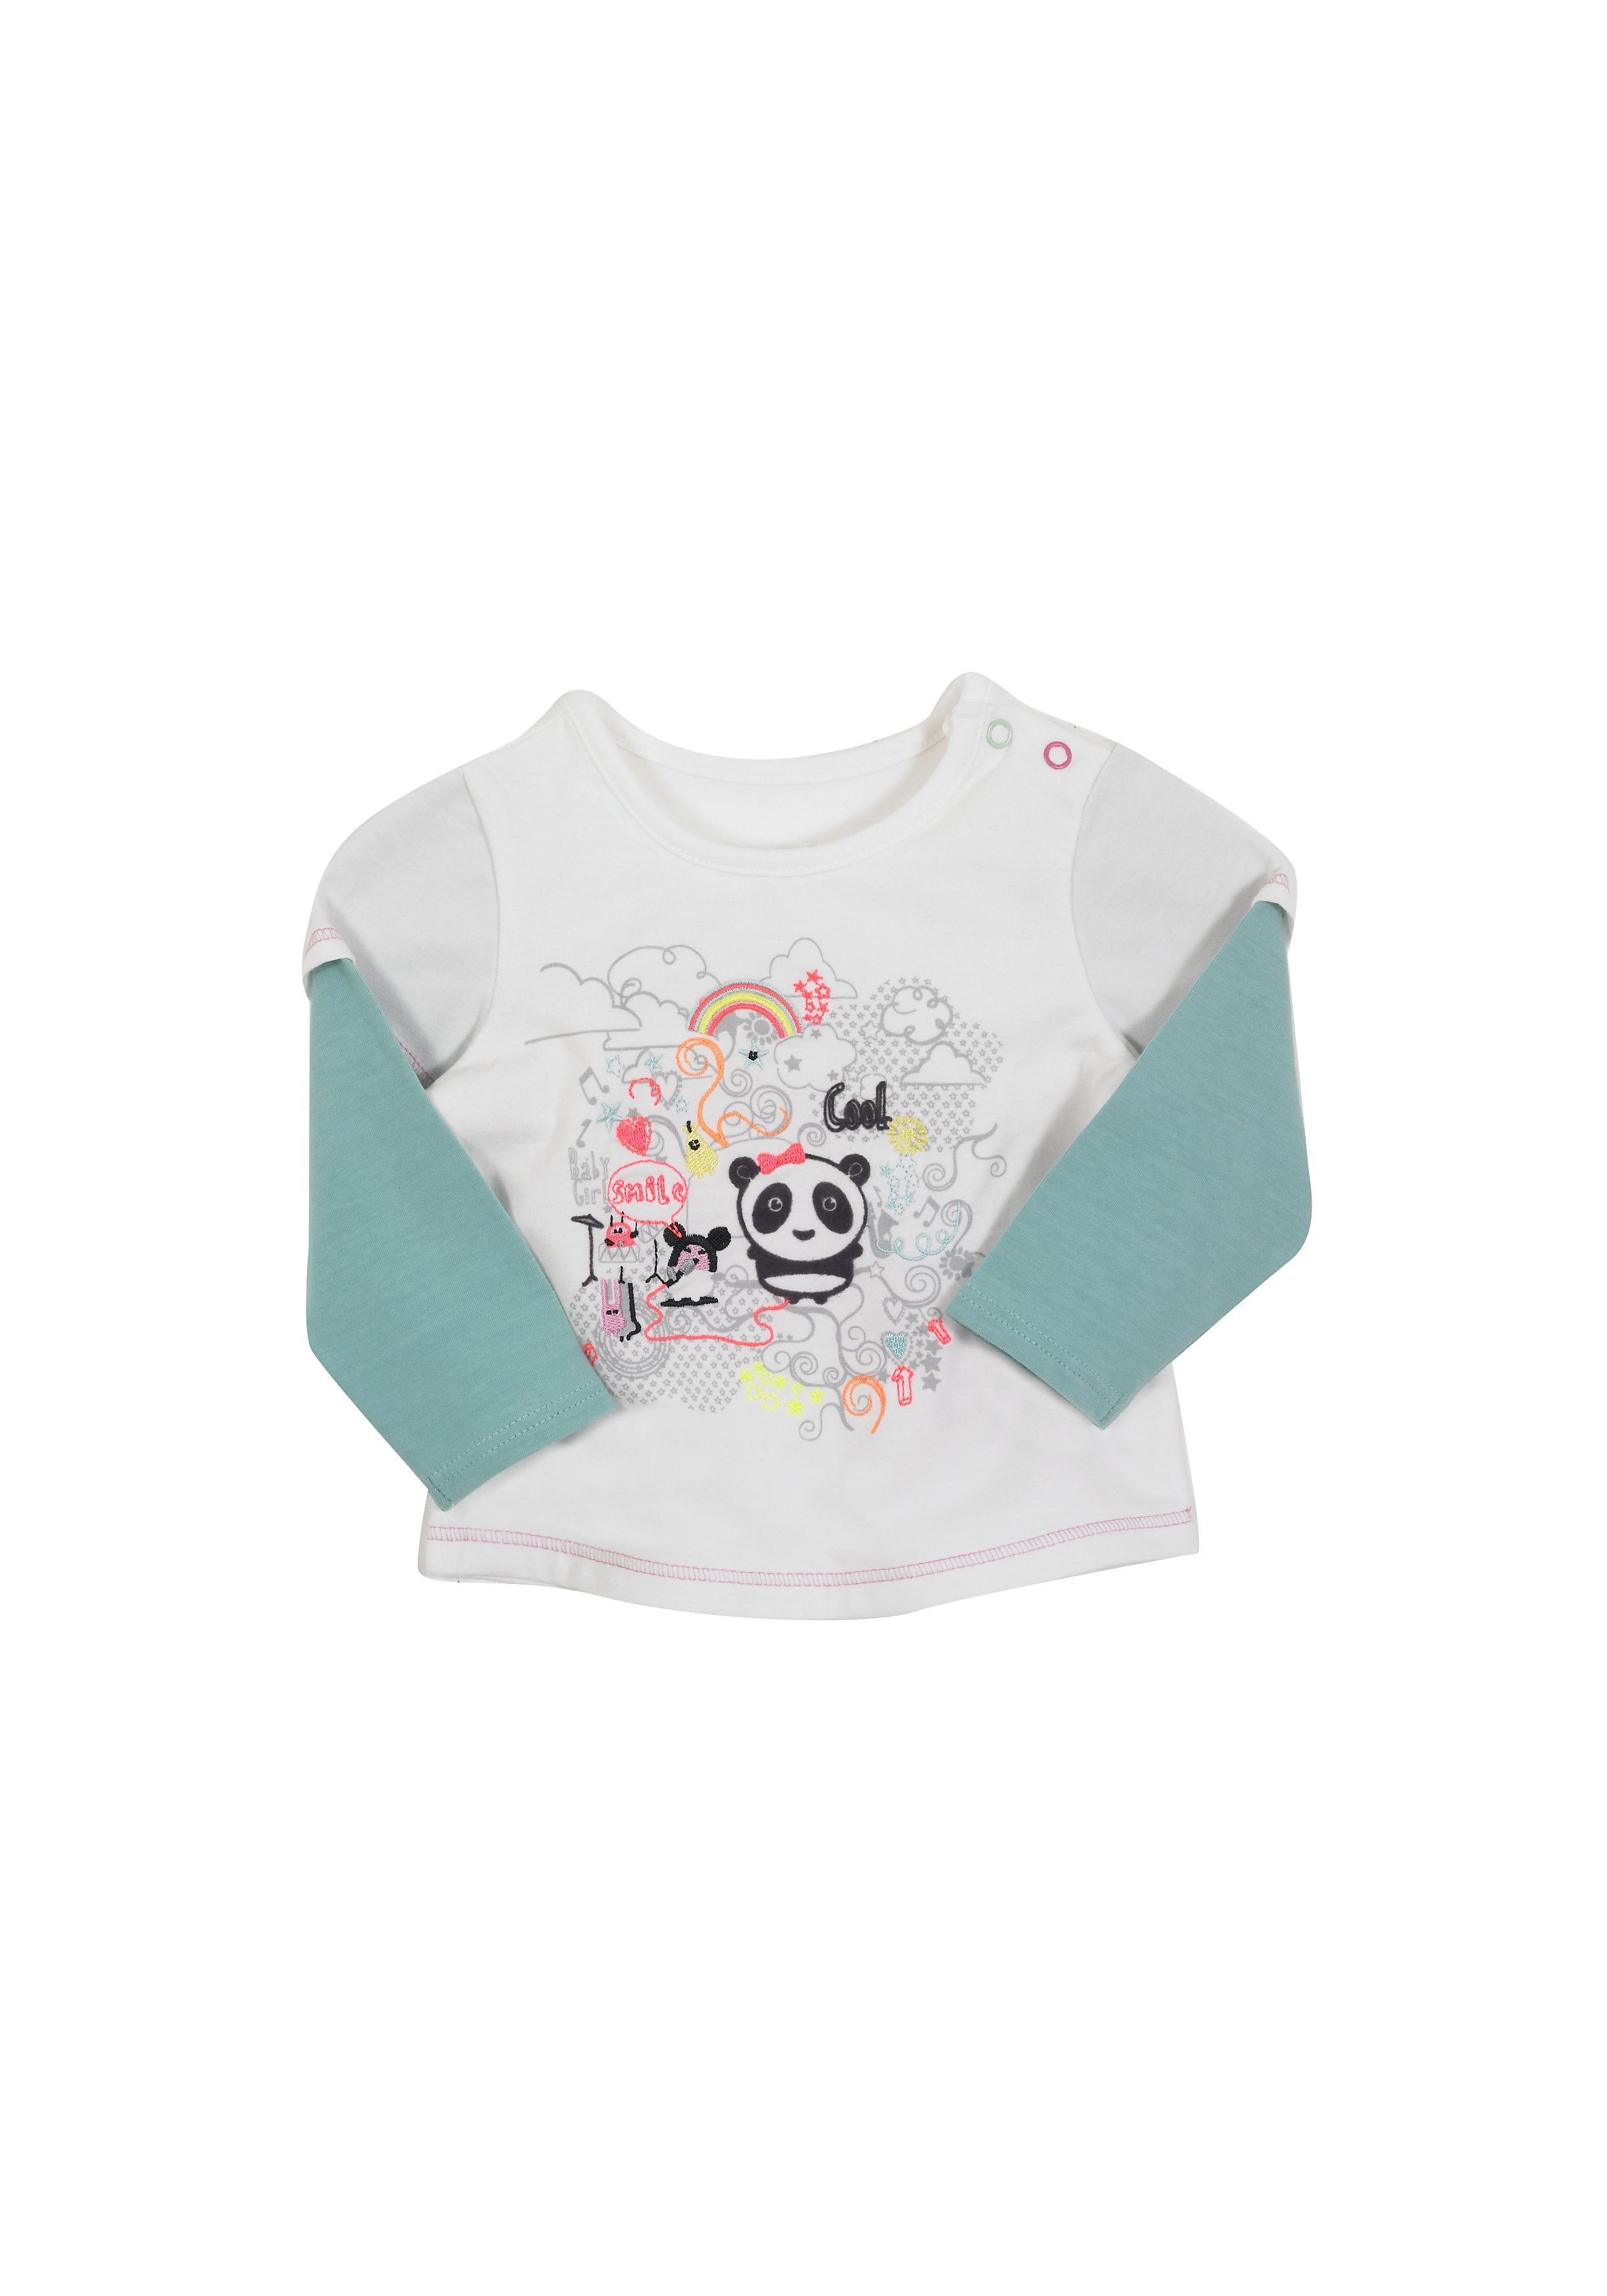 Mothercare | Girls Sleeveless Swim Suit Polka Dot Print - Red